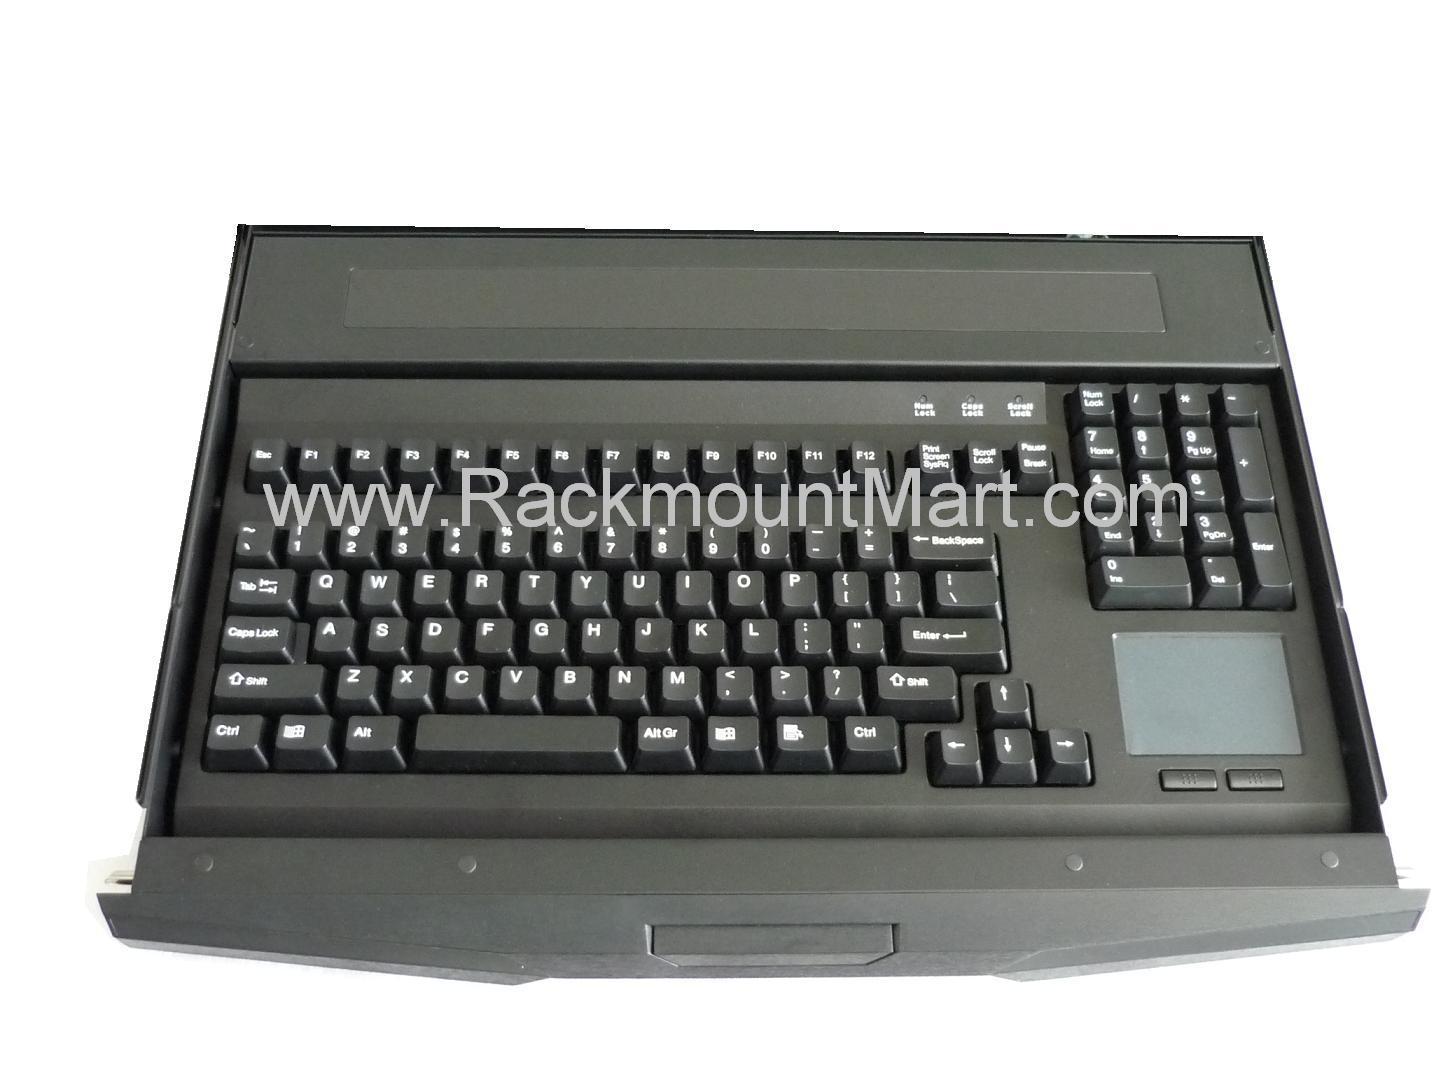 Lcdk1002 1u Rackmount Keyboard With Front Lock Optional